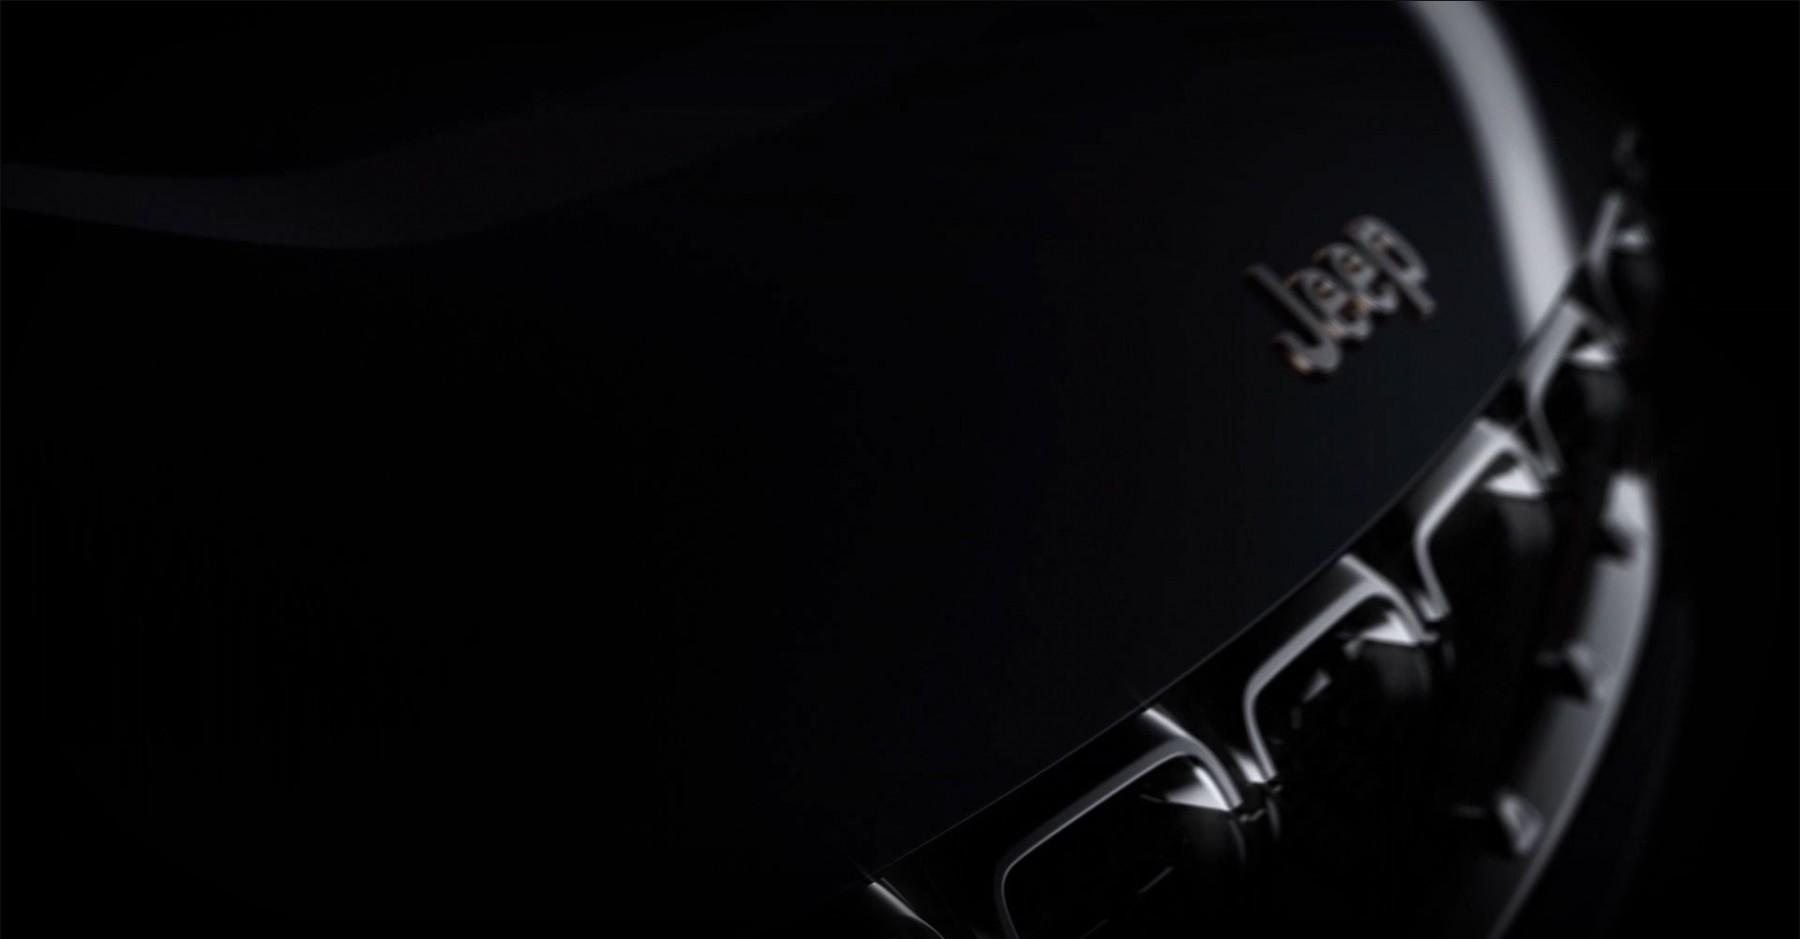 Jeep - Nuovo SUV 7 posti - Teaser